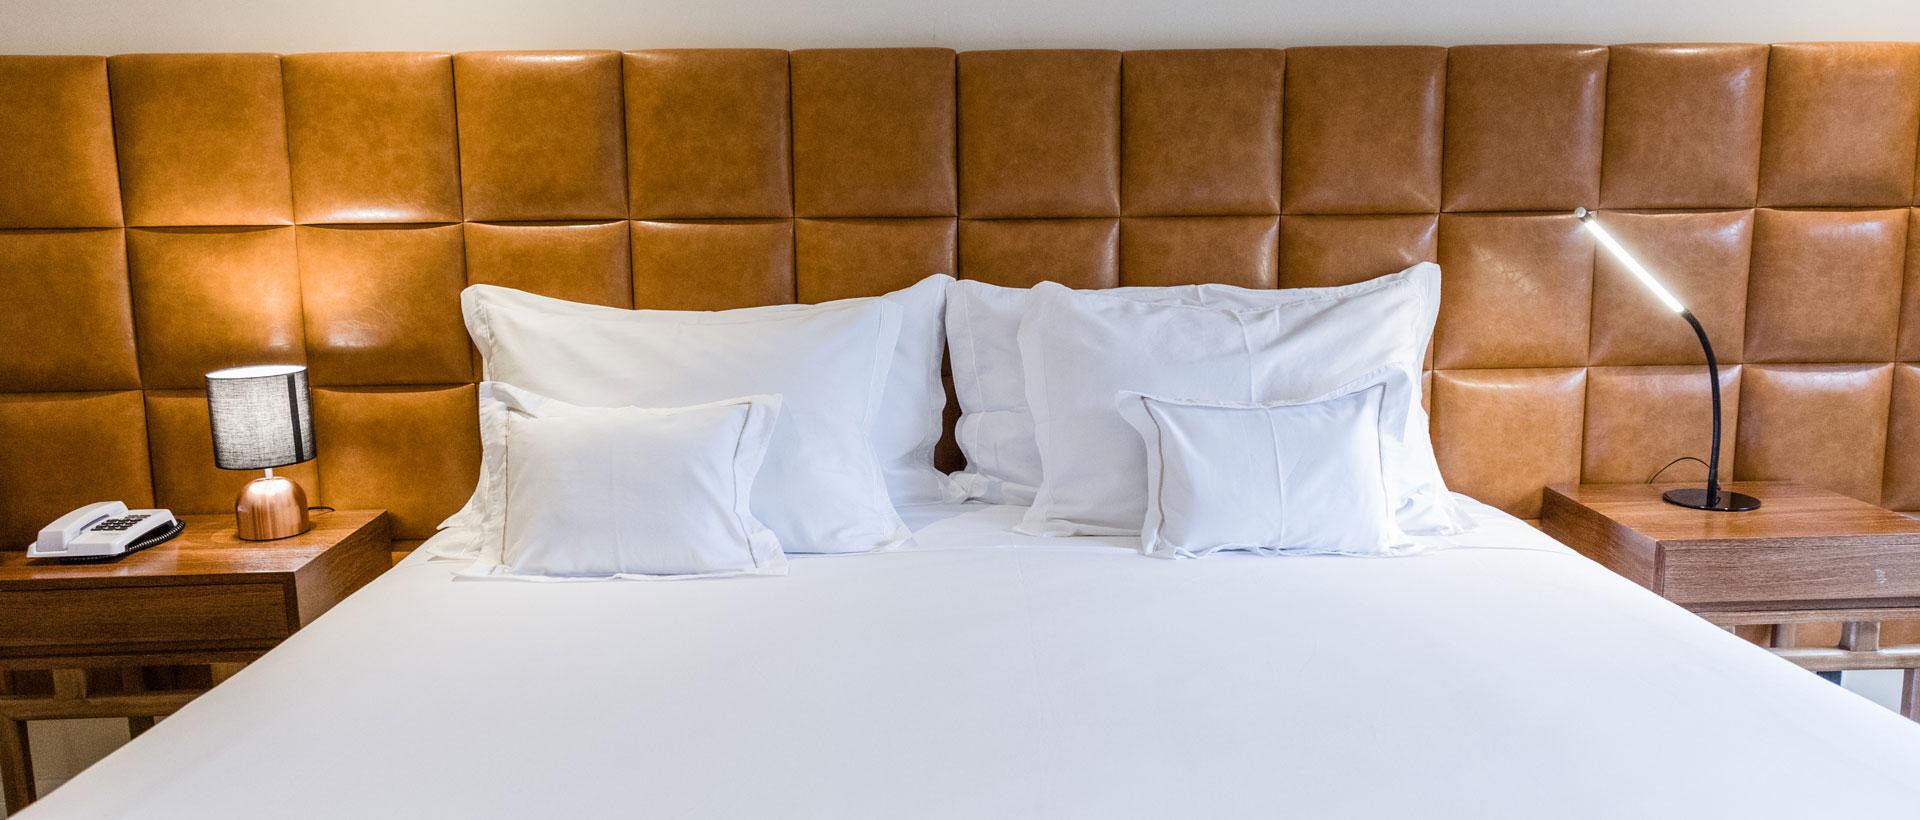 acomodacoes-hotel-boutique-quebra-noz-conforto-e-natureza-1